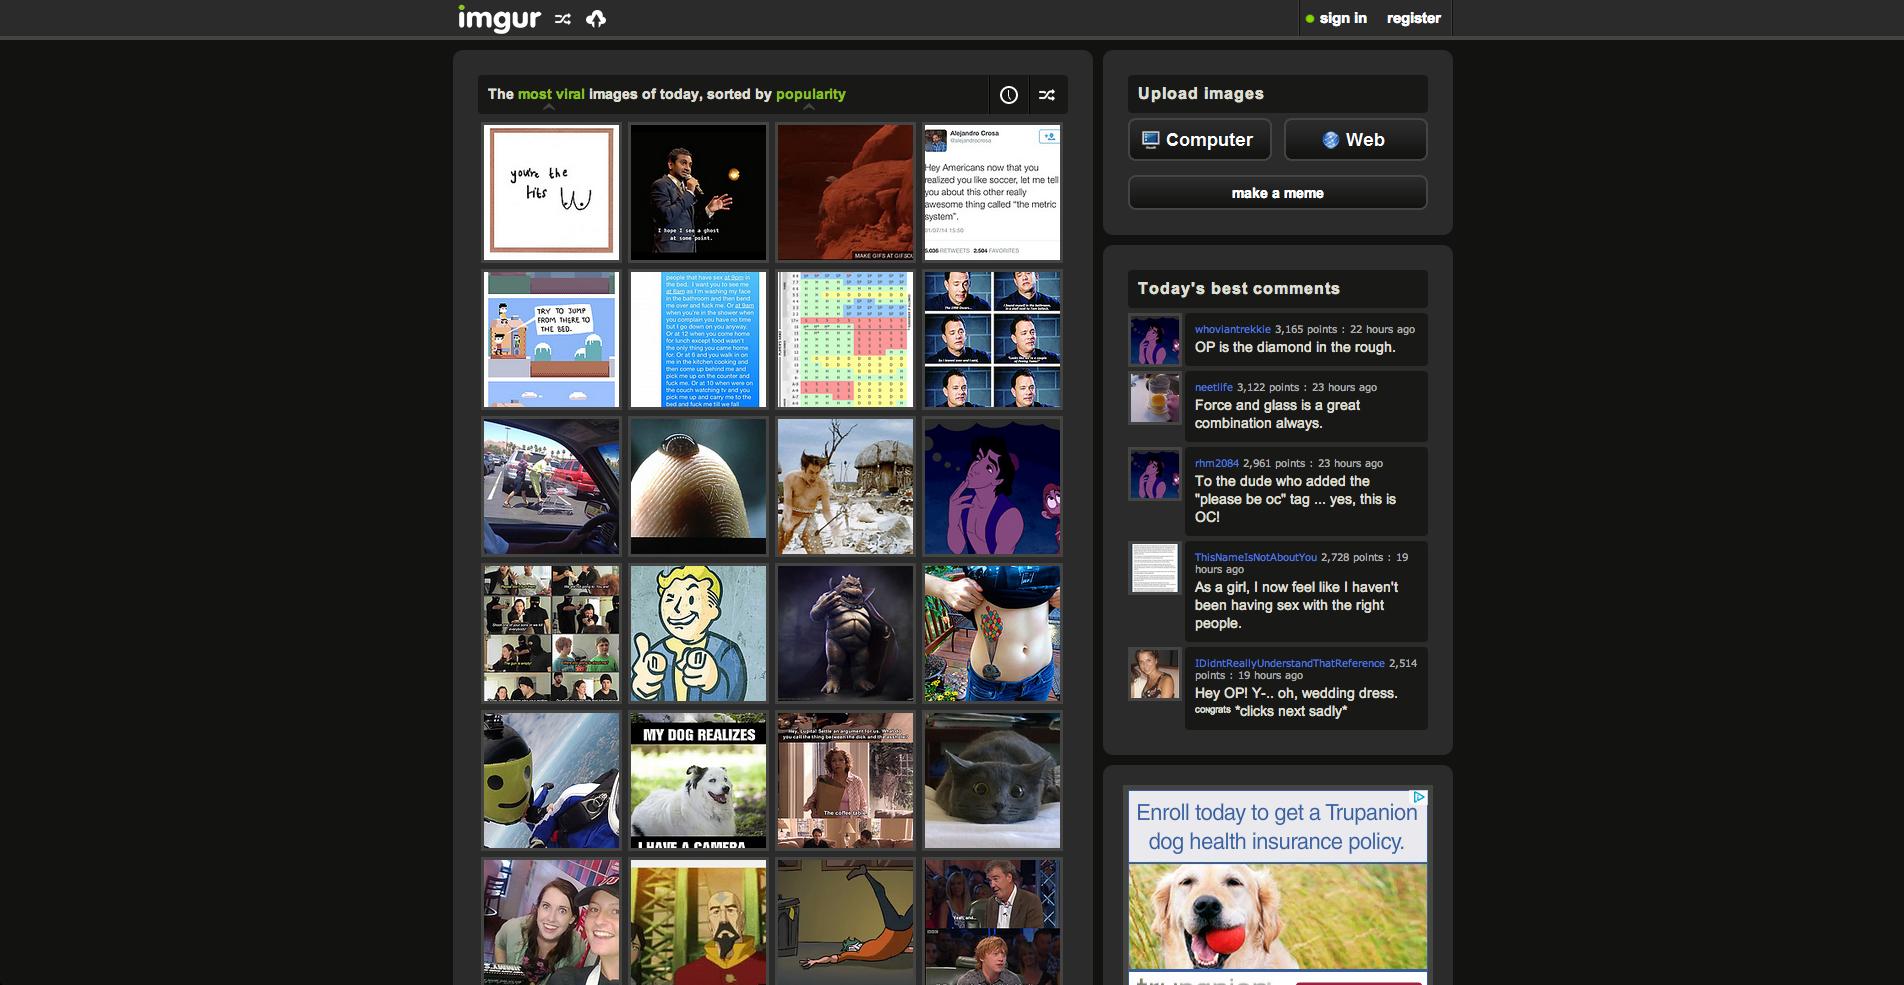 The Imgur homepage.